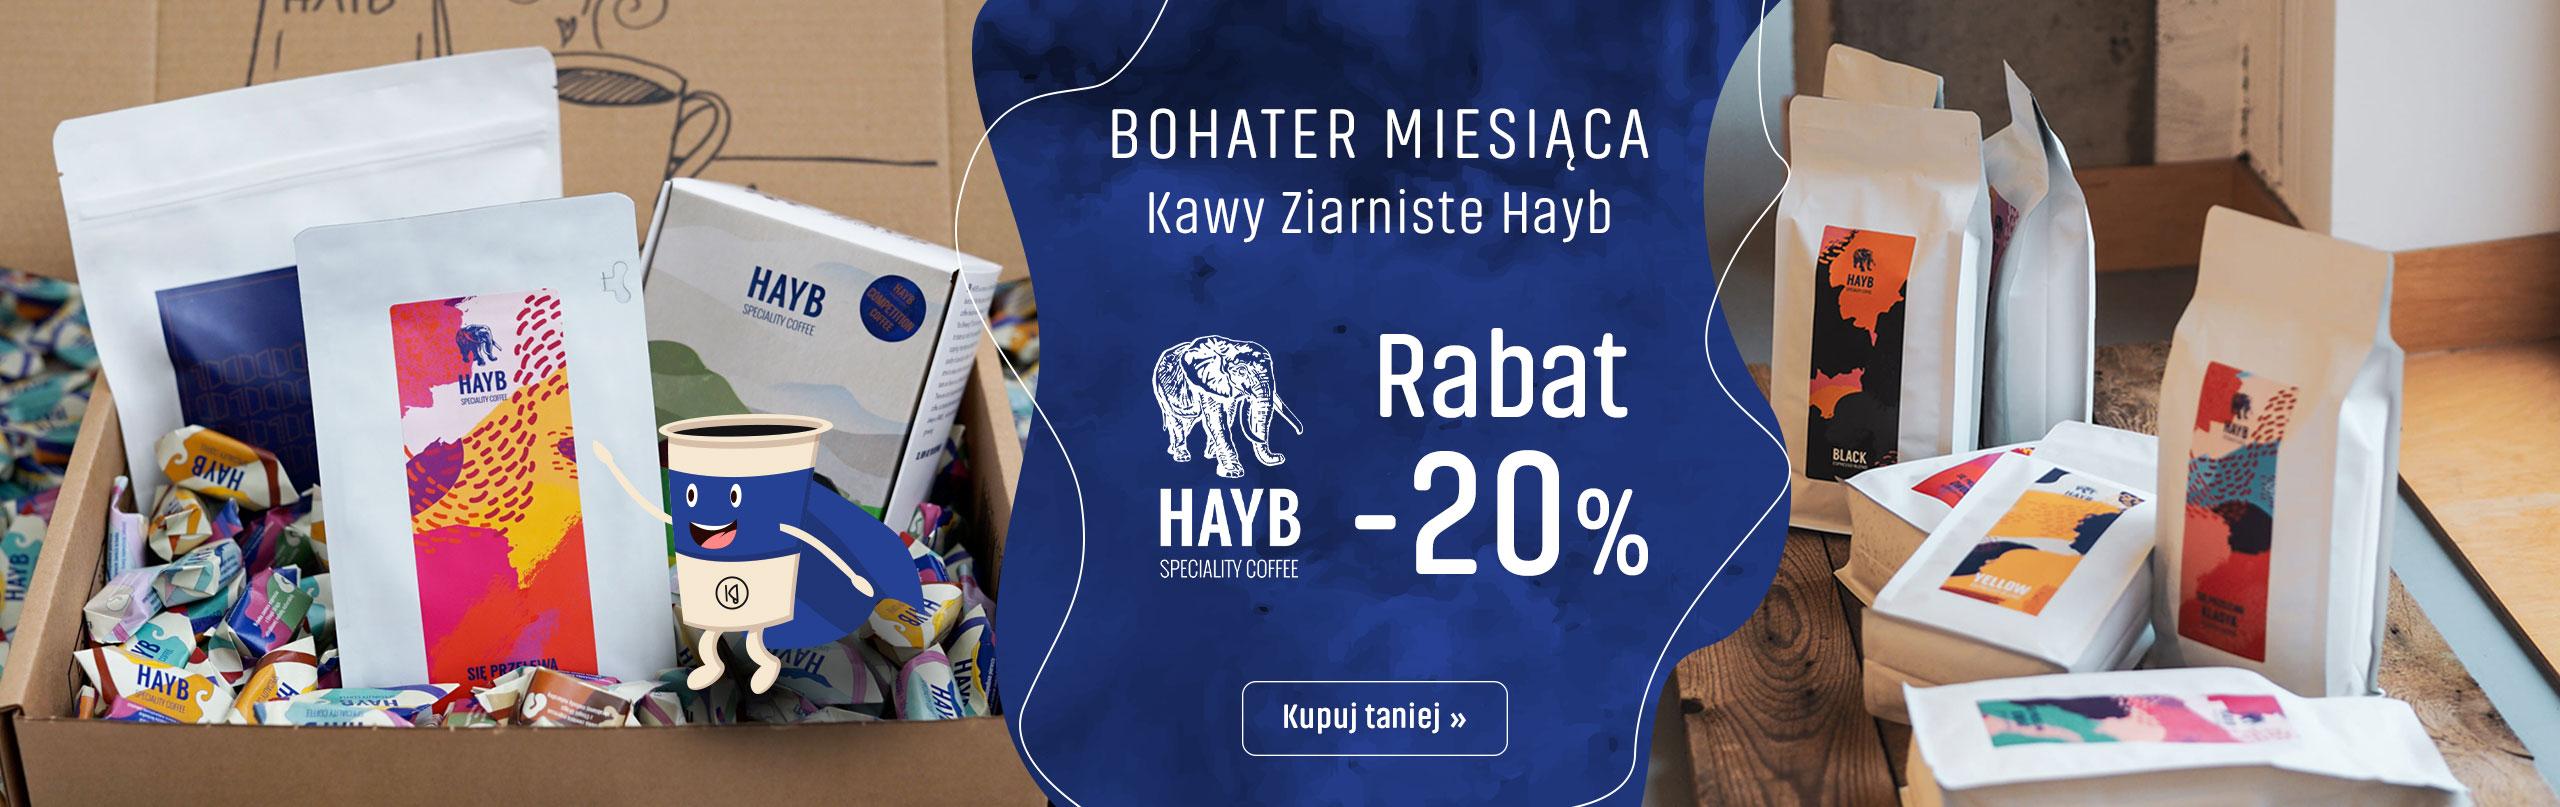 Bohater miesiaca palrnia Hayb z Rabatem -20%